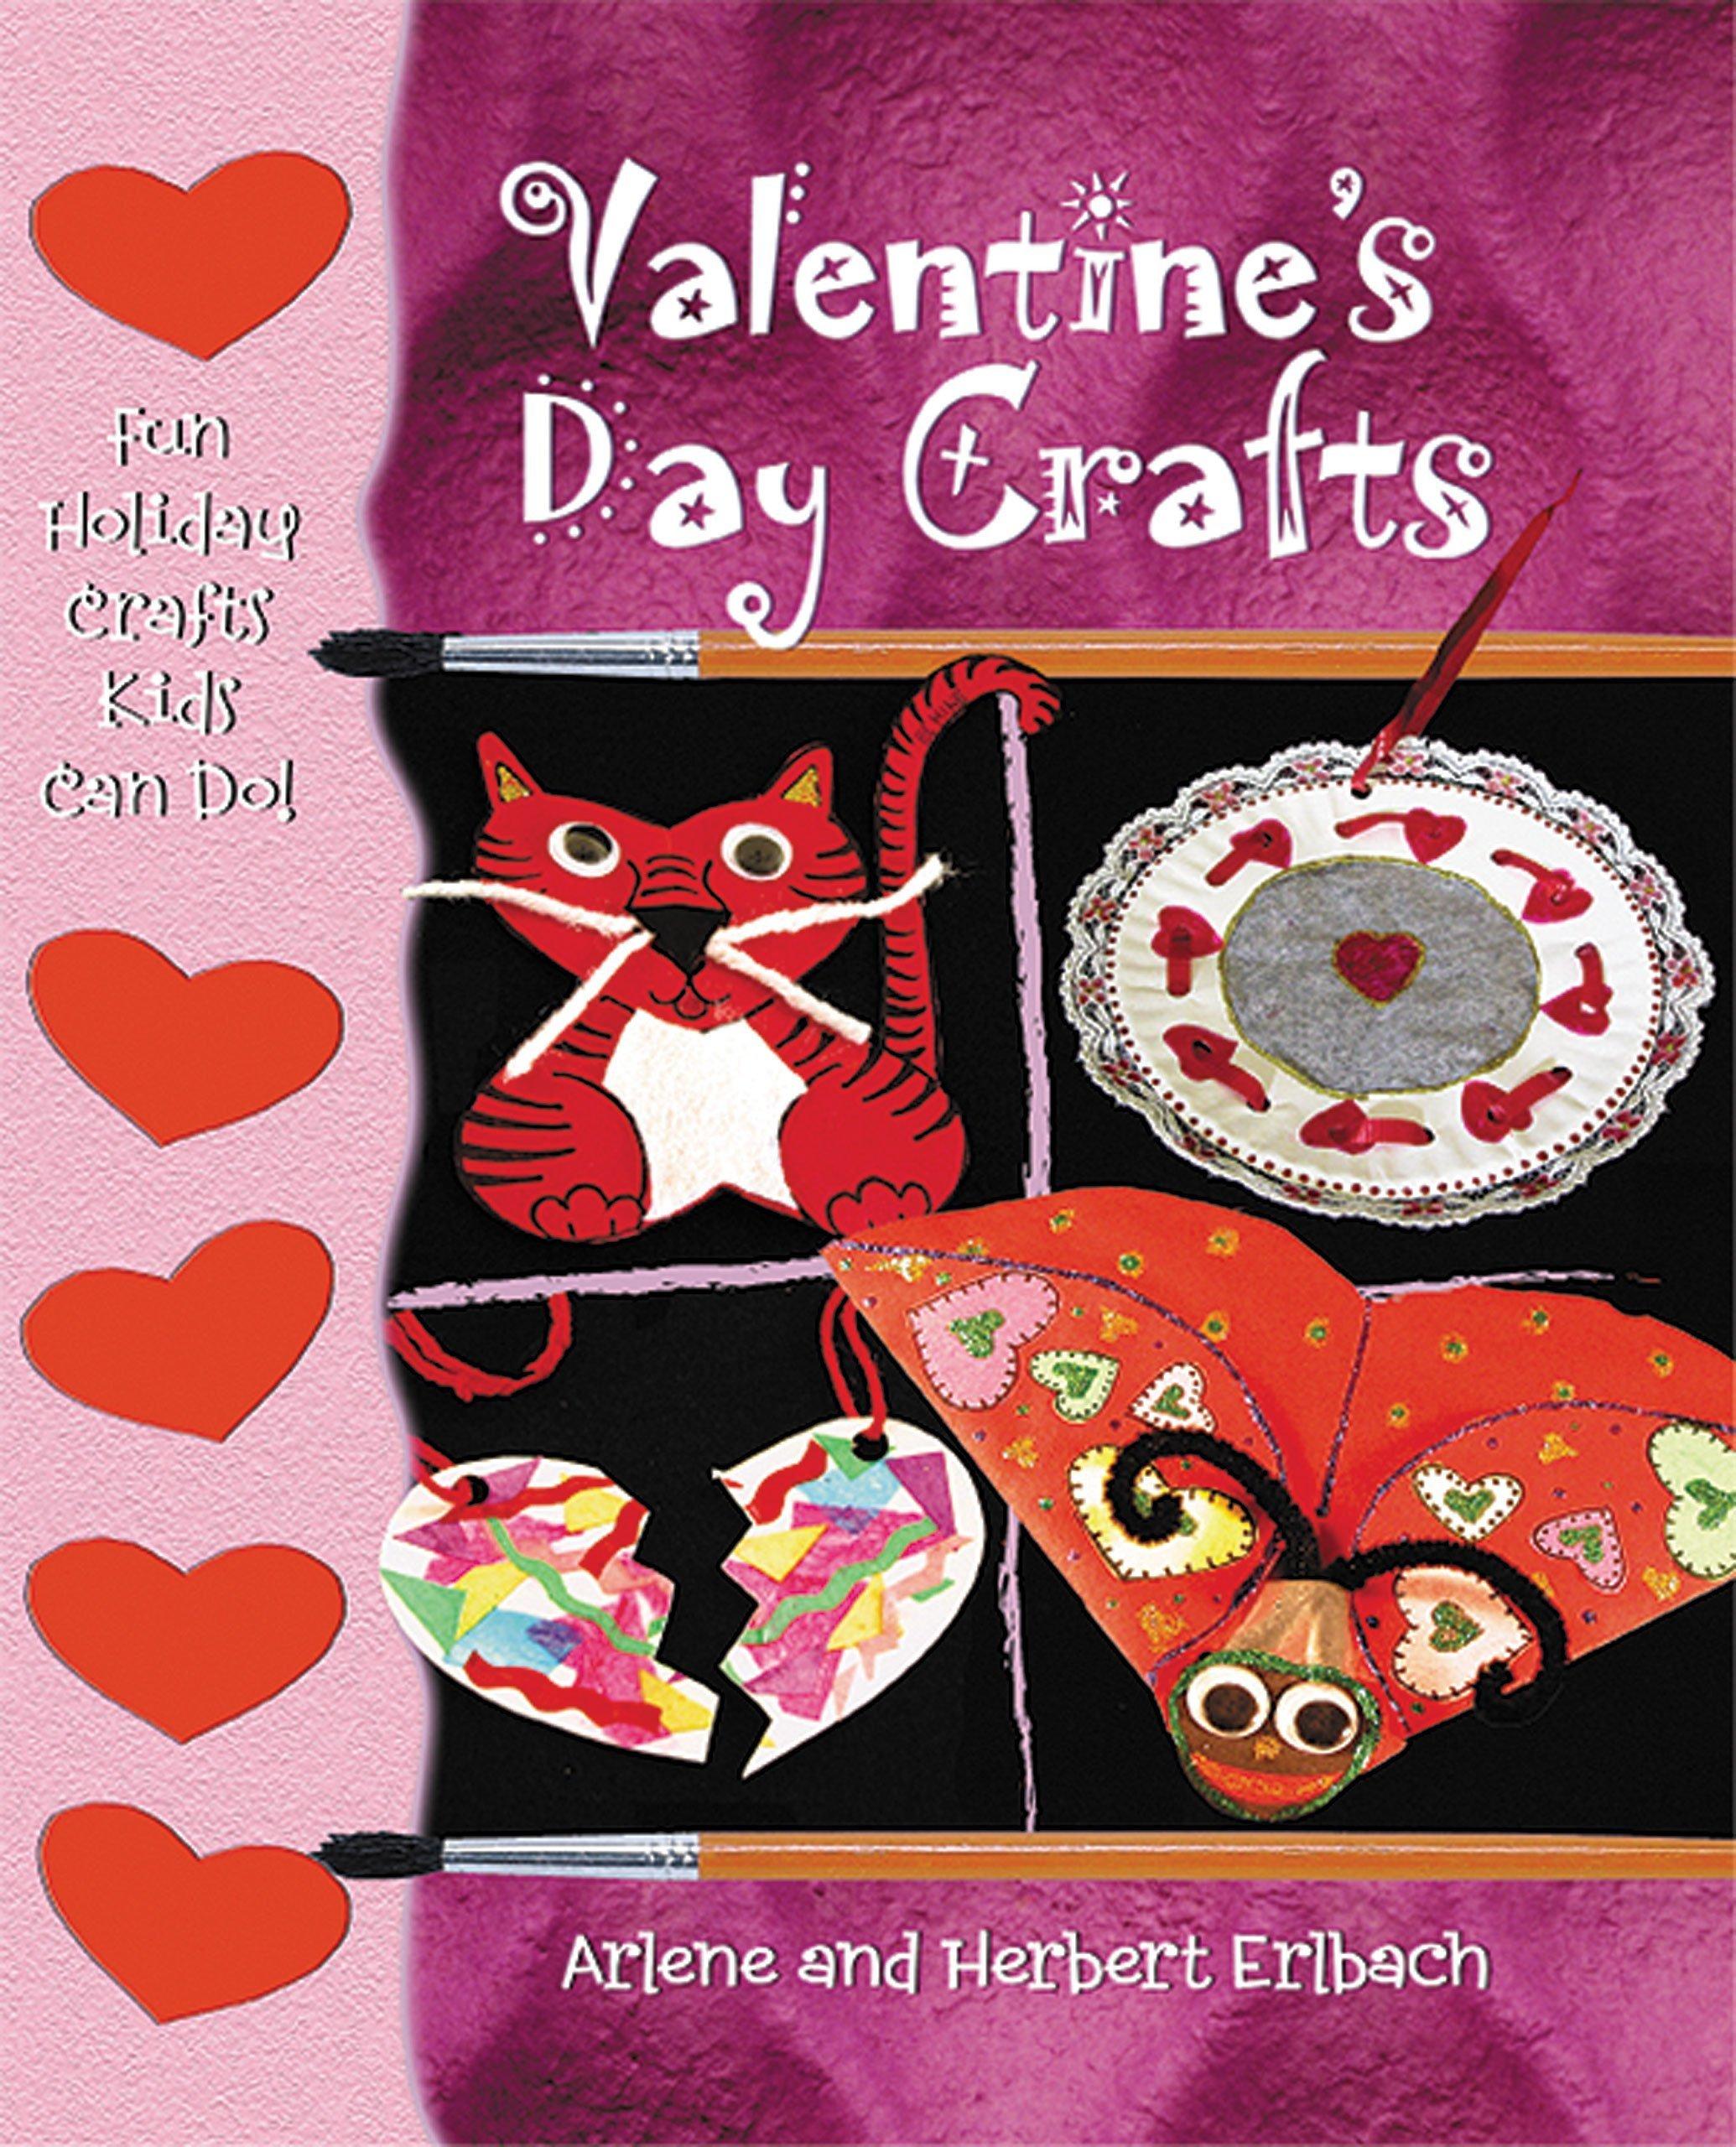 Valentine\'s Day Crafts (Fun Holiday Crafts Kids Can Do): Arlene ...